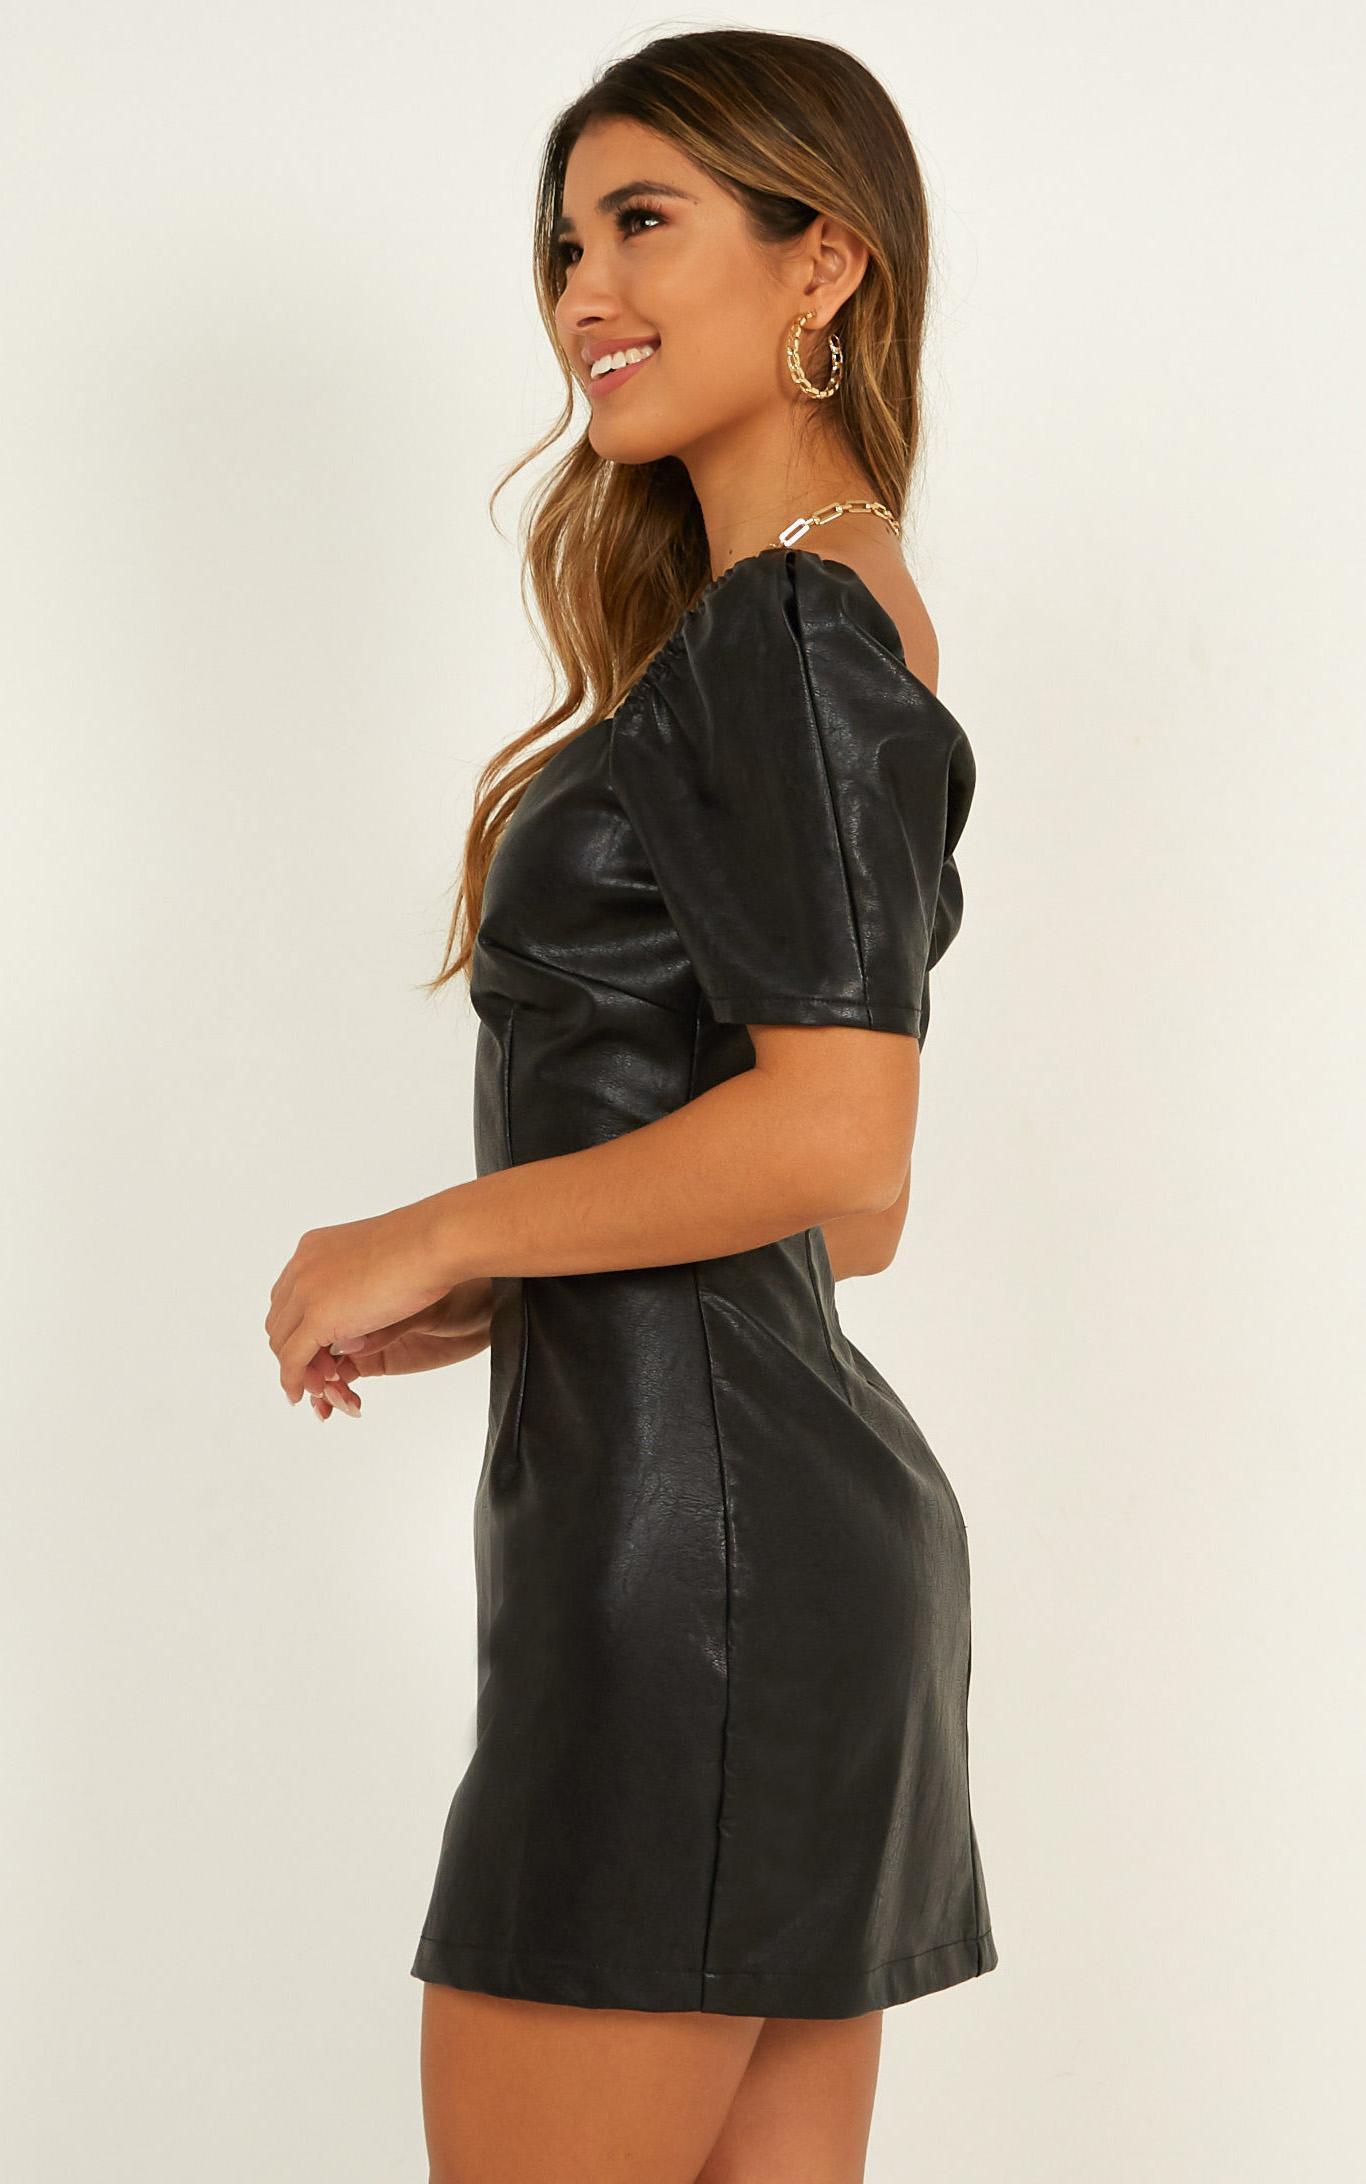 Love is gone dress in black leatherette - 14 (XL), Black, hi-res image number null